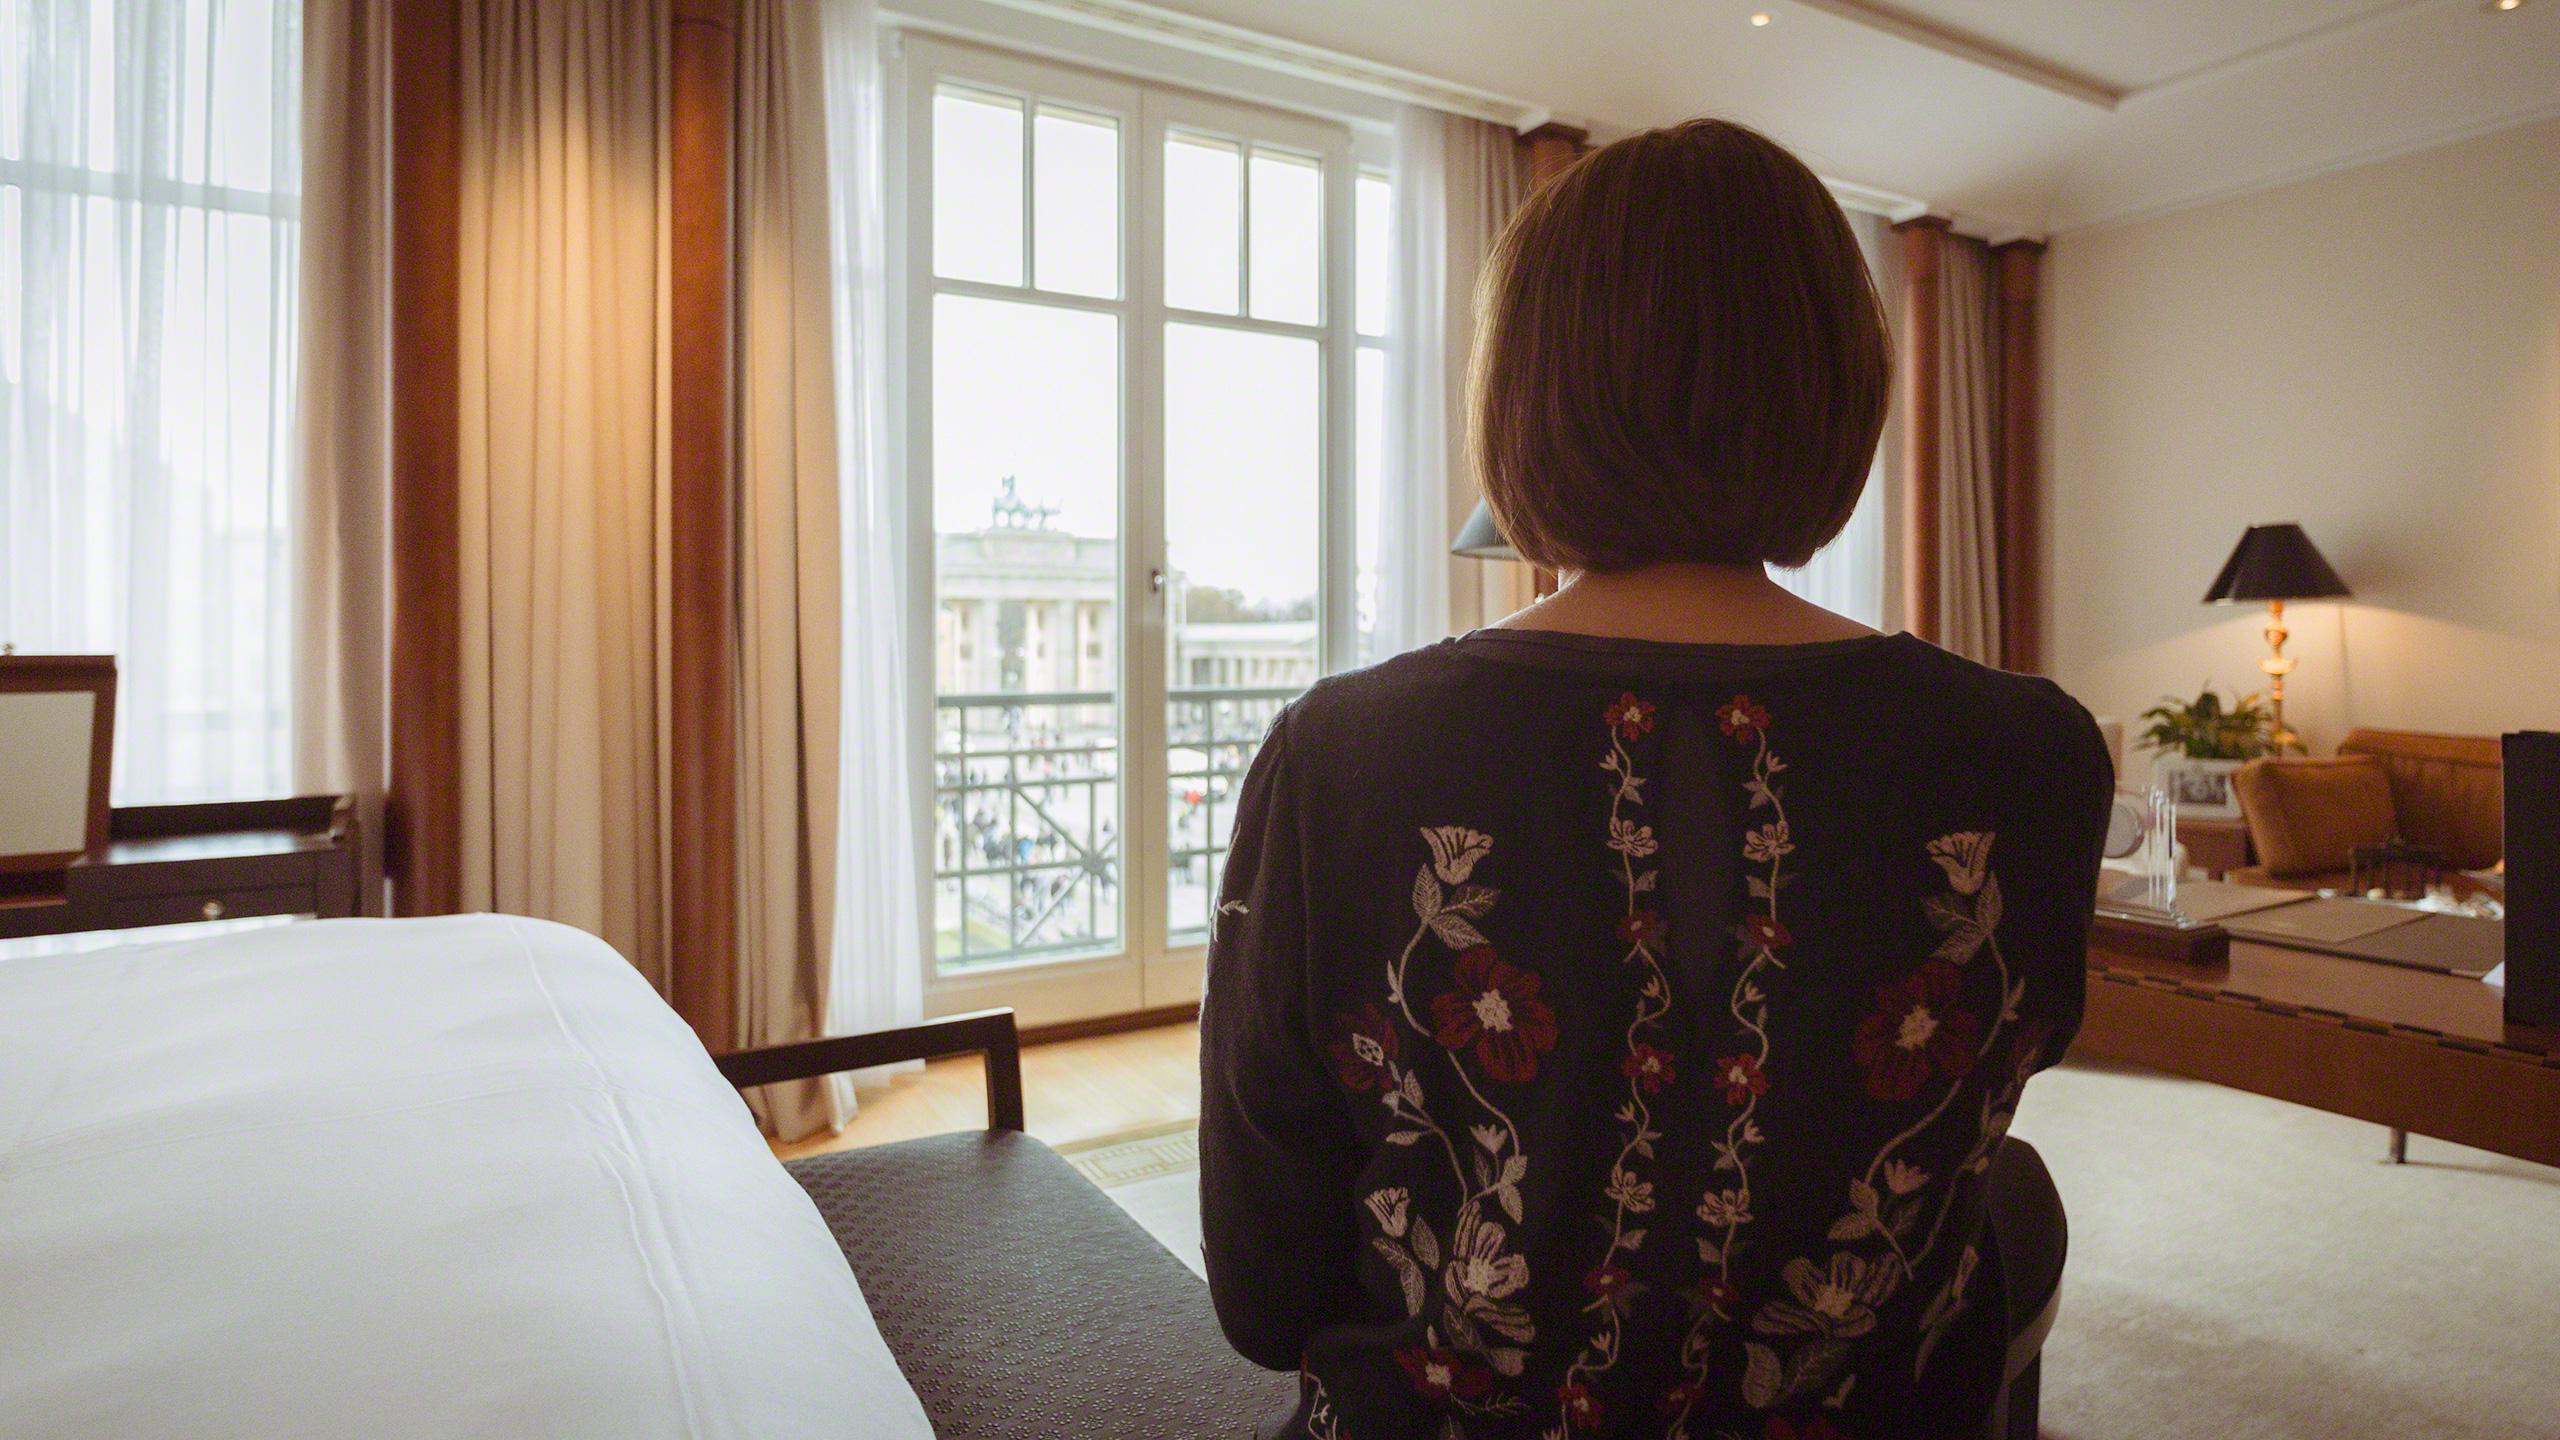 Luxushotel Adlon Kempinski Berlin Suite Ausblick